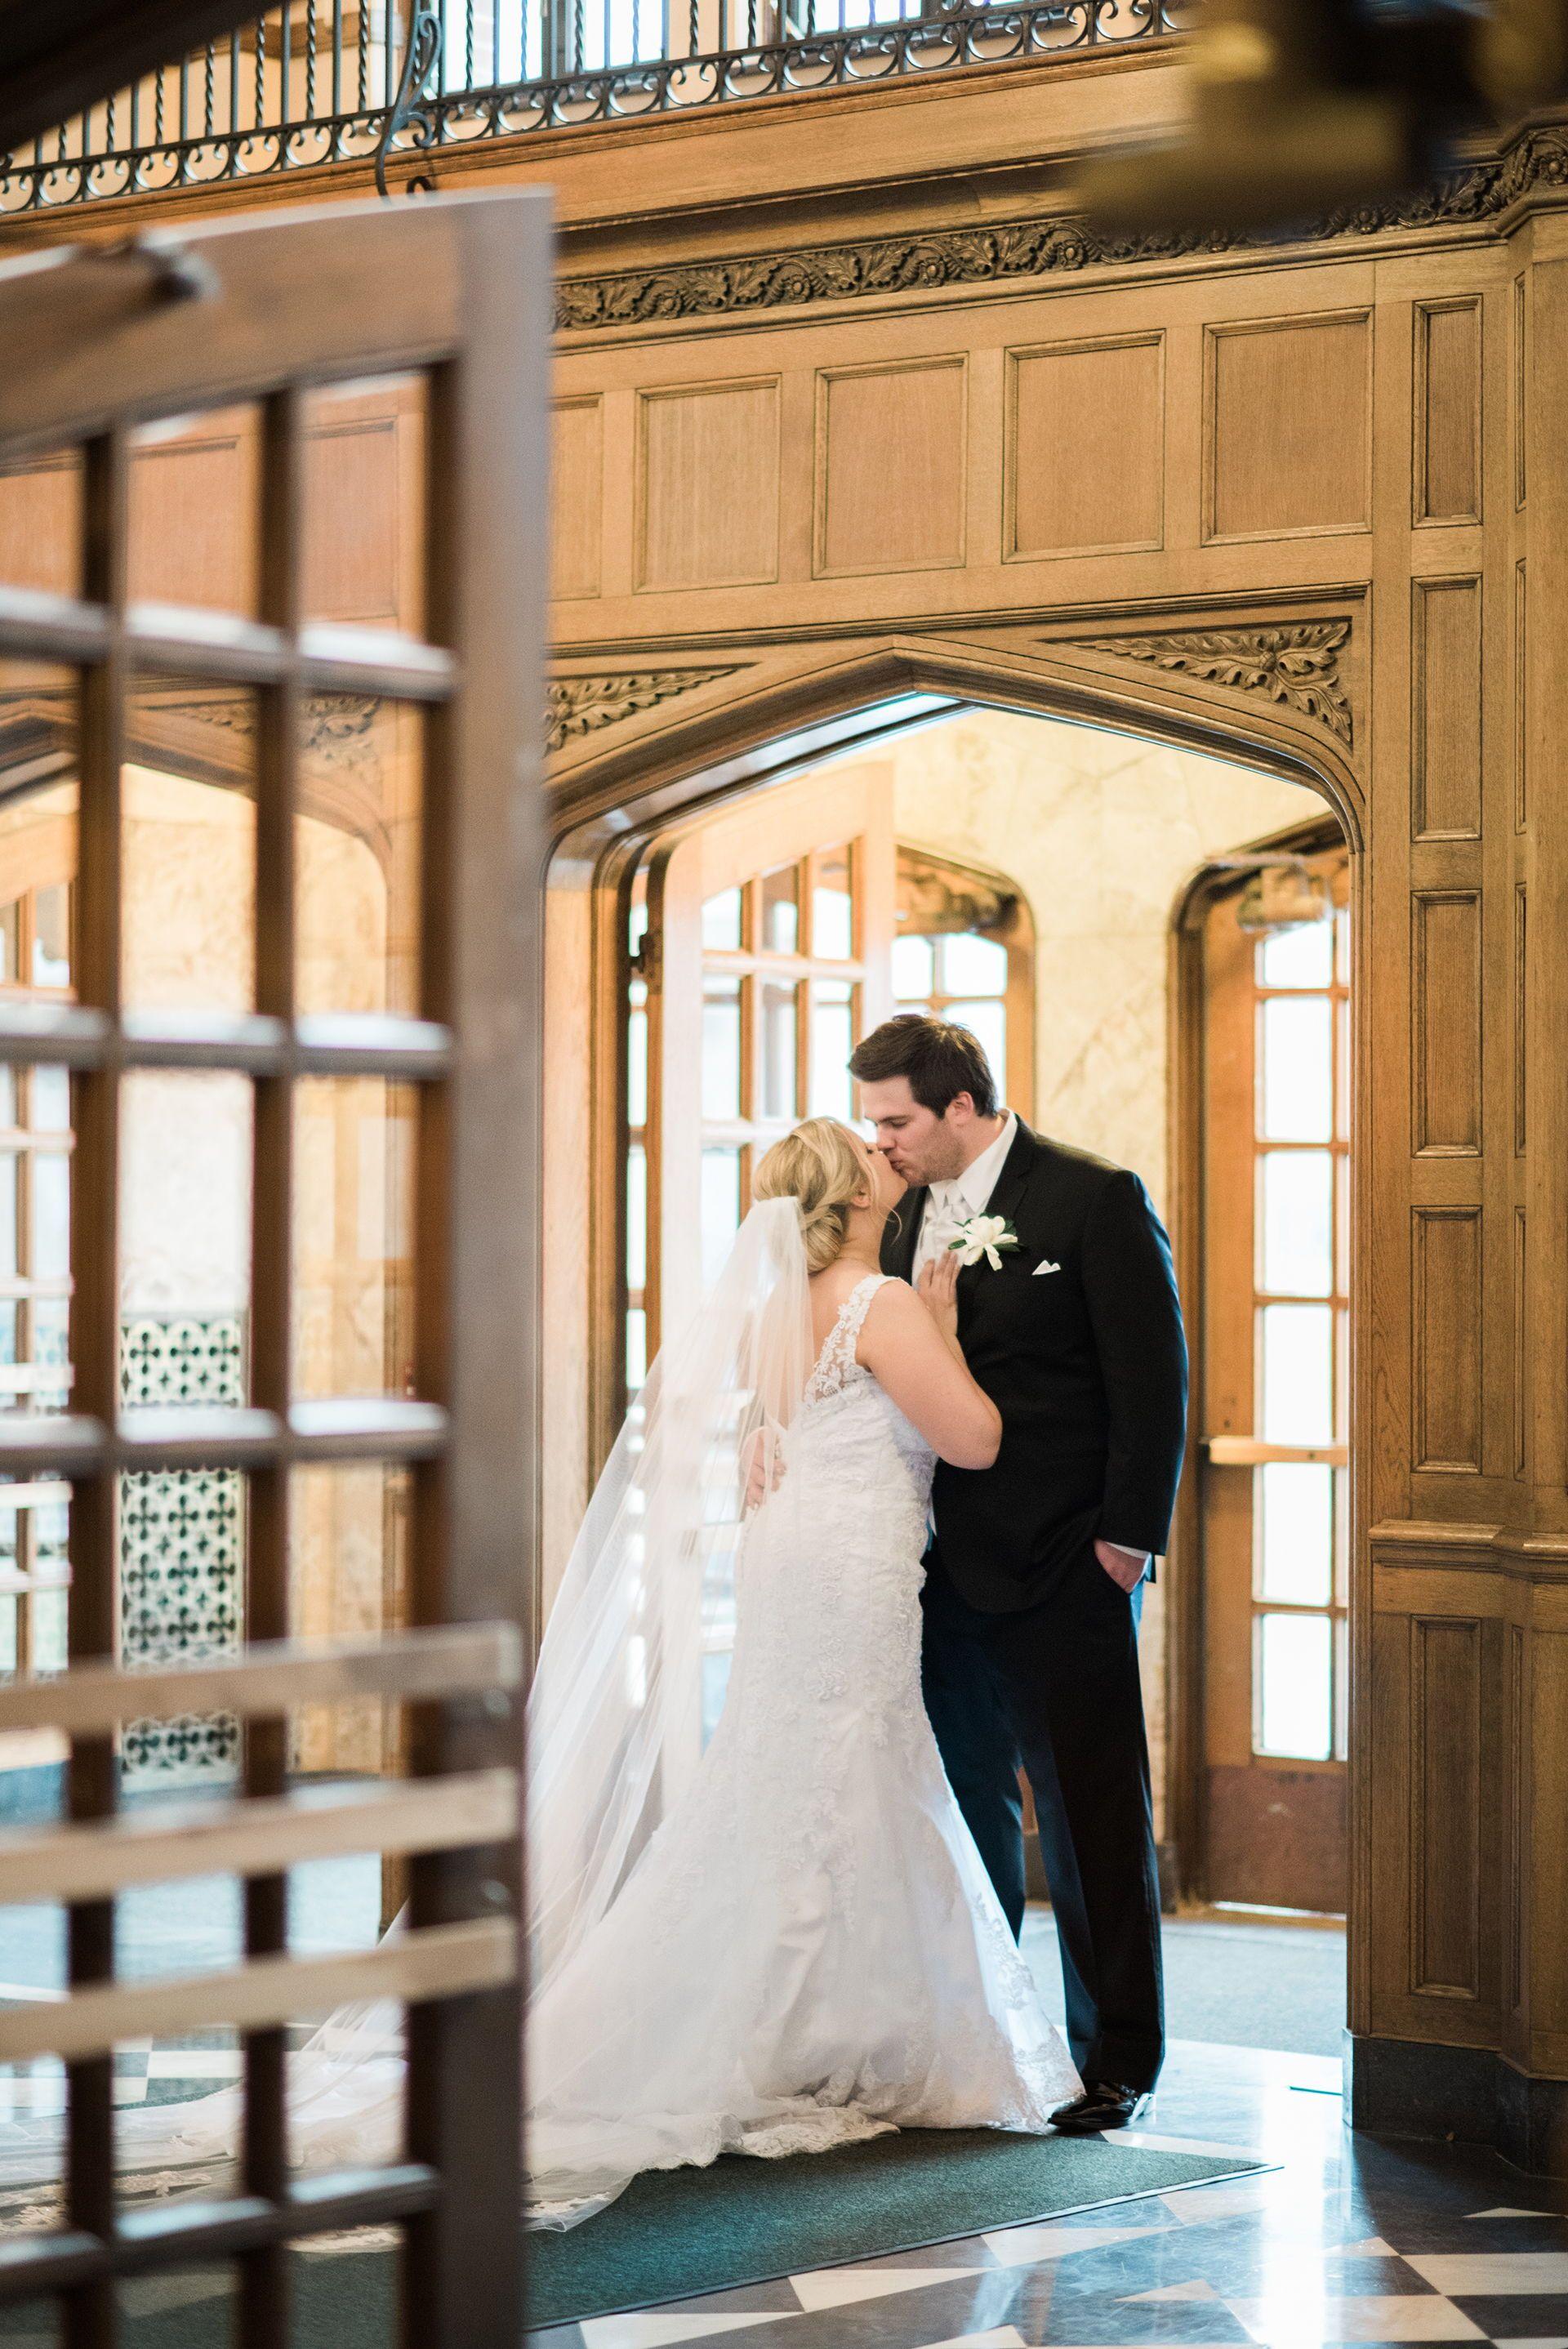 Royal Wedding Inspiration: Timeless Gold Ballroom Wedding